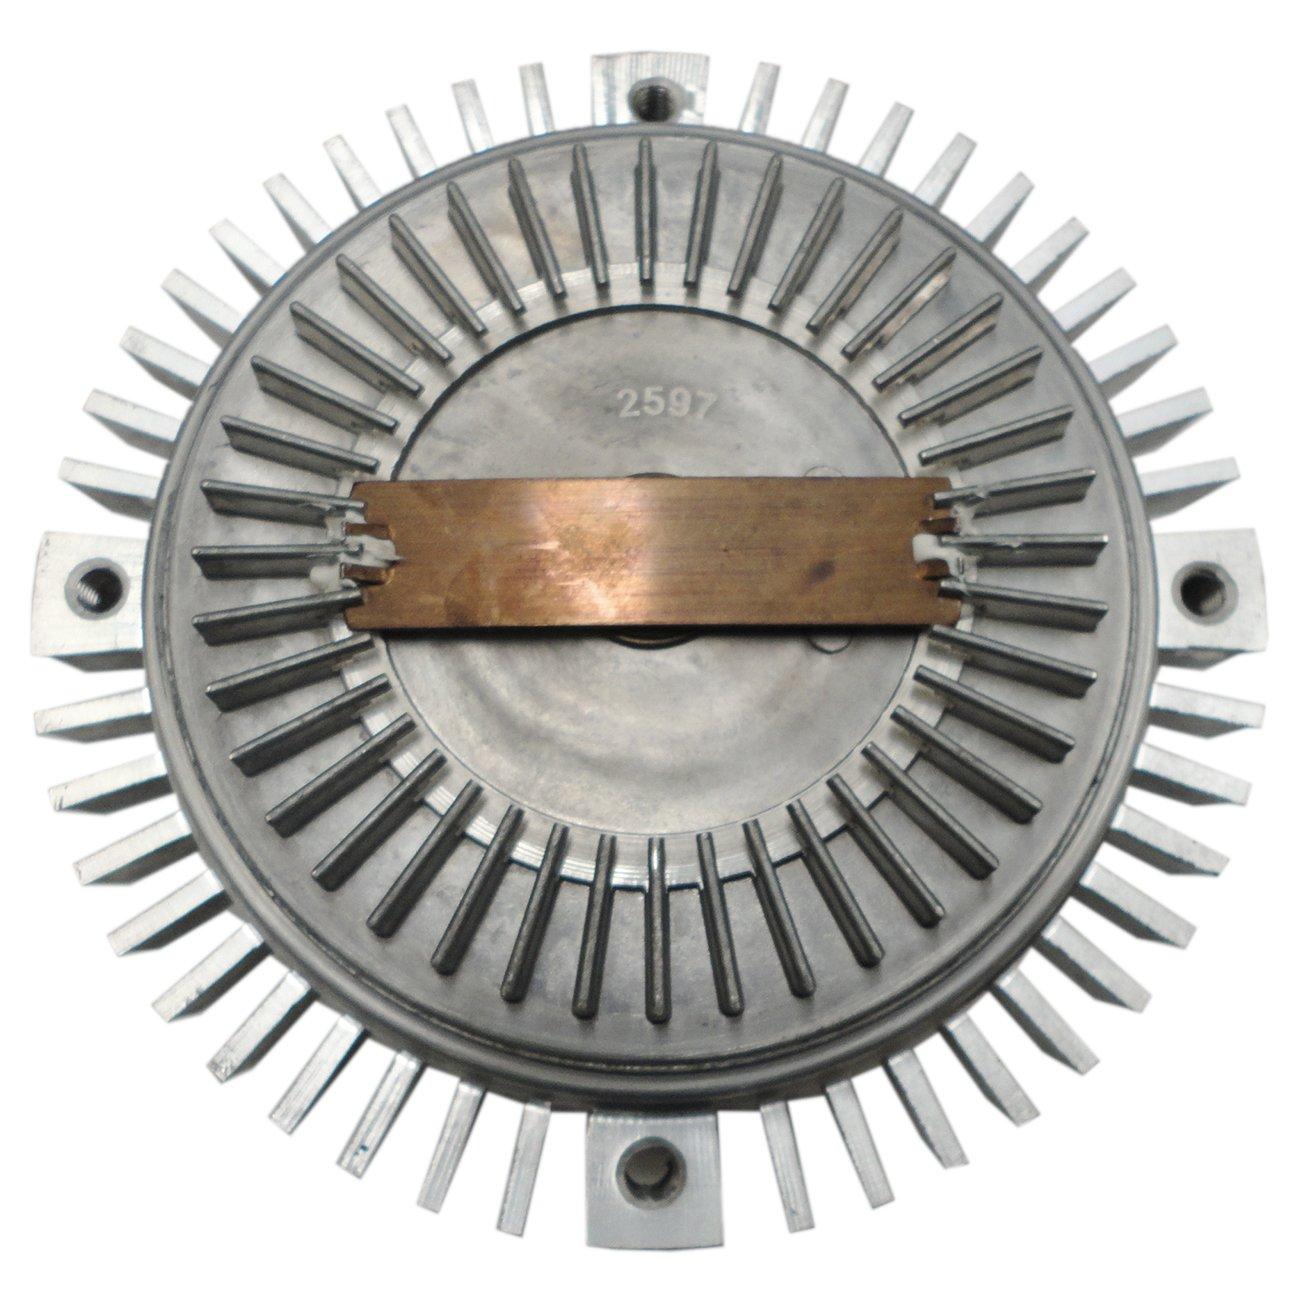 TOPAZ 2597 Engine Cooling Thermal Fan Clutch for Audi A4 A6 S4 Allroad Quattro Volkswagen Passat 2.7L 2.8L V6